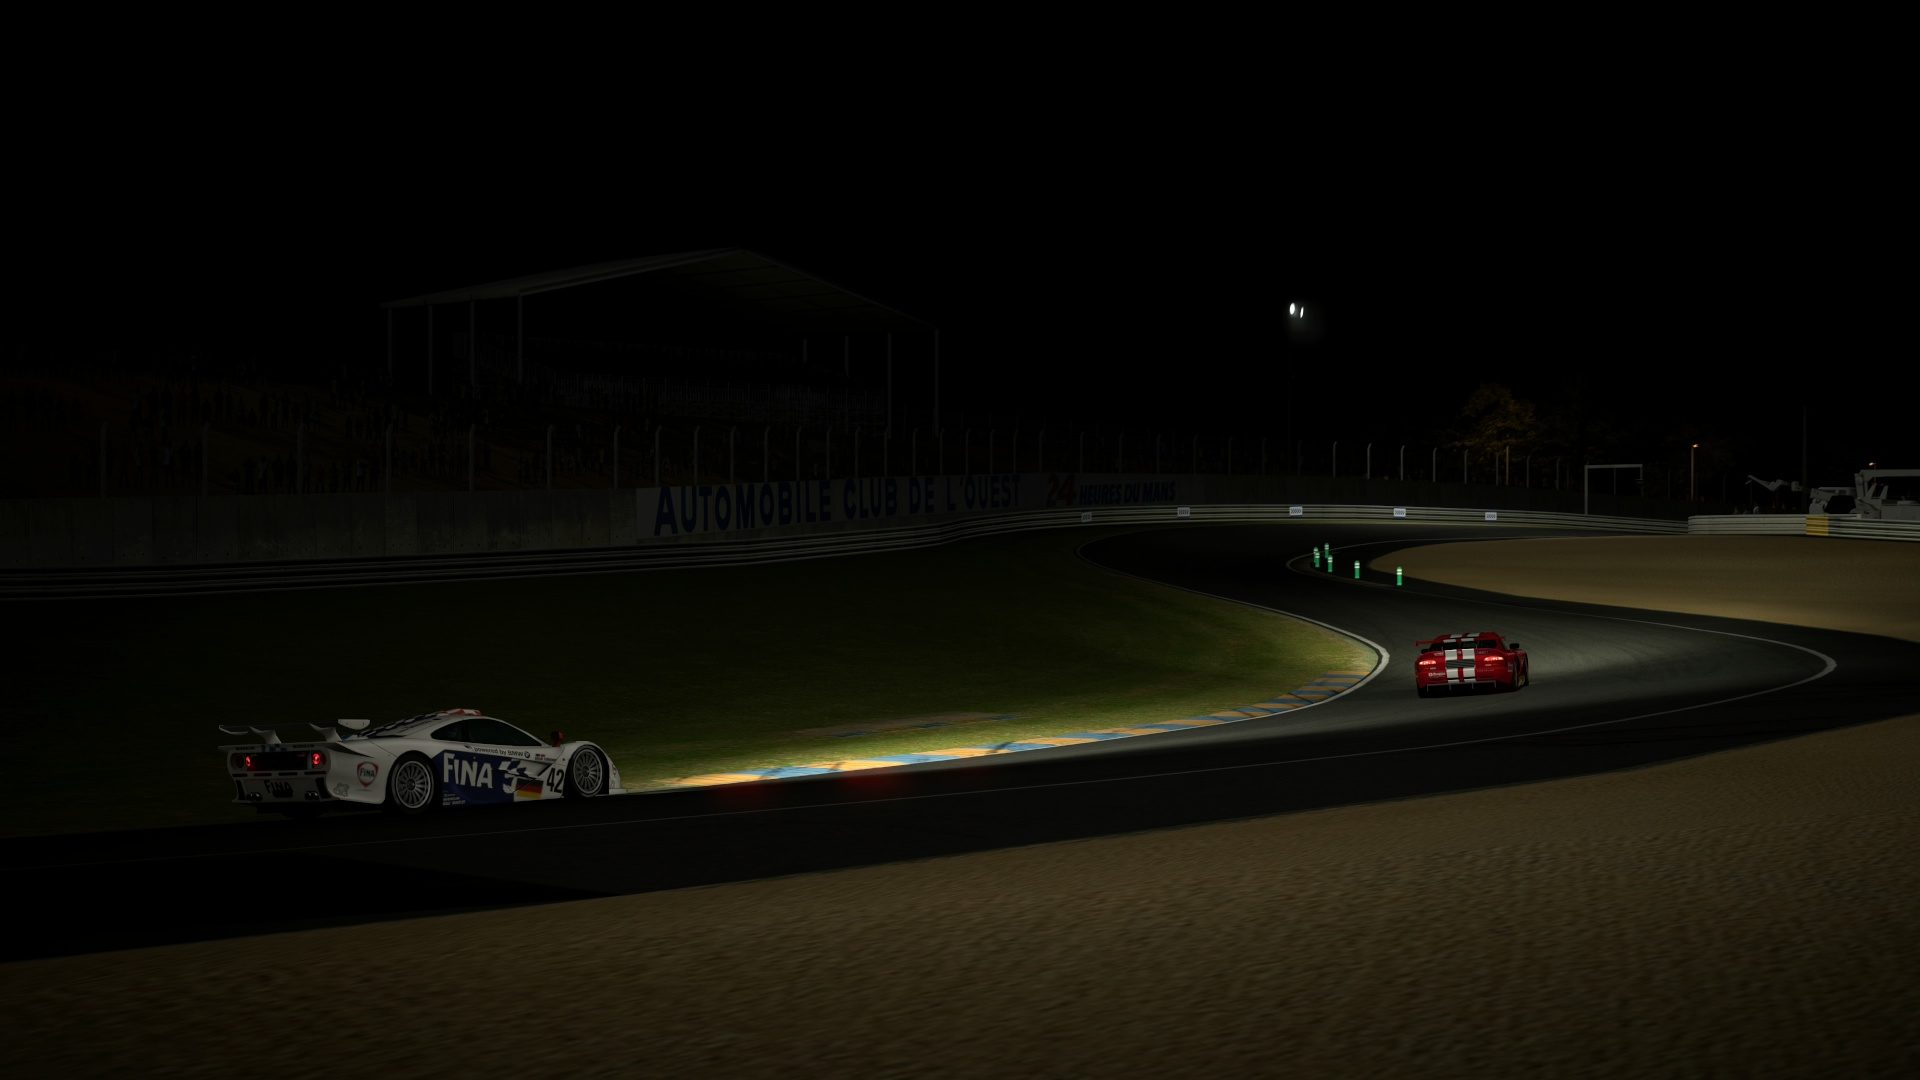 Circuit de la Sarthe 2009_4.jpg